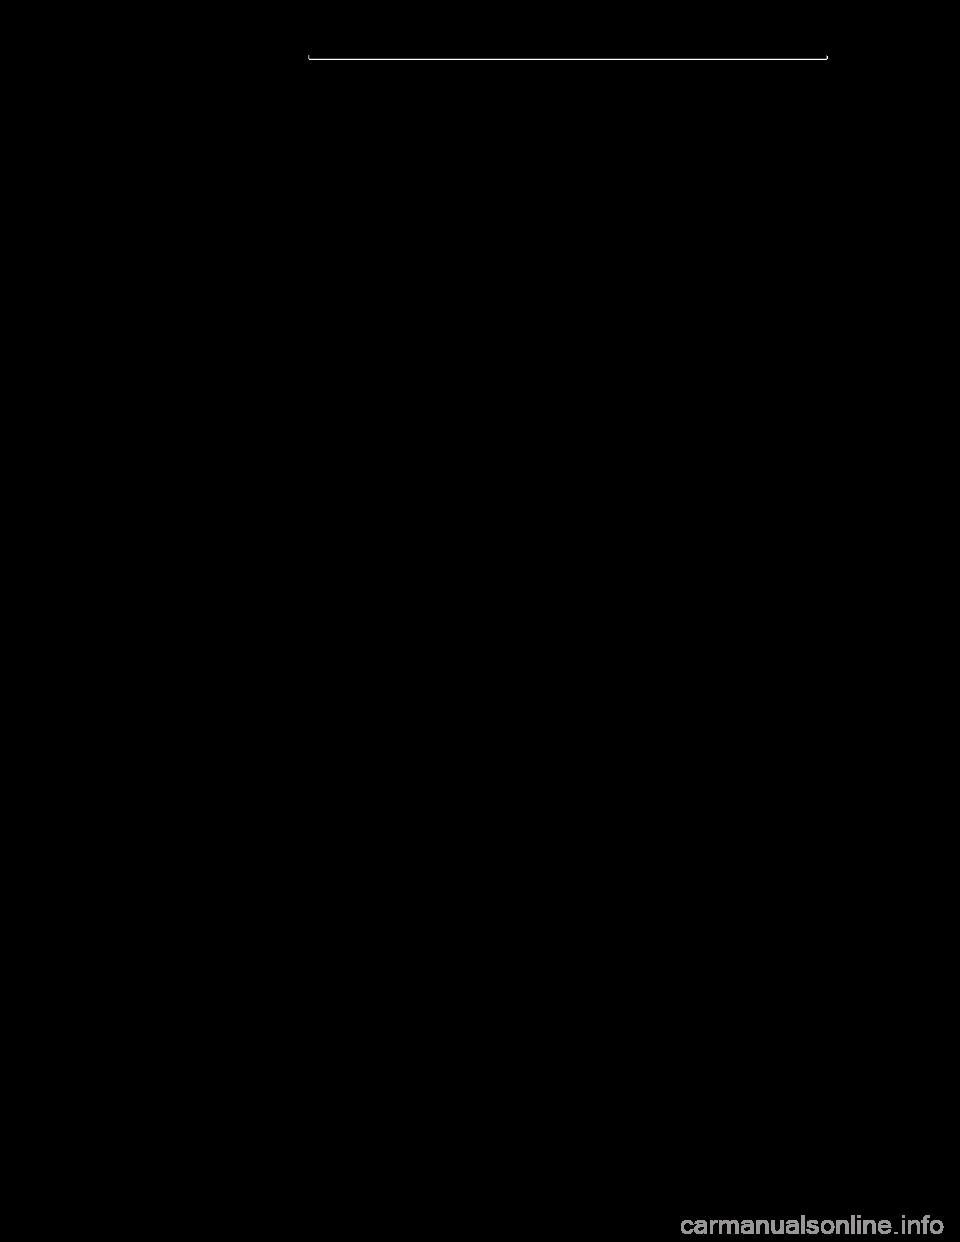 1998 Dodge Ram 1500 Front Axle Diagram